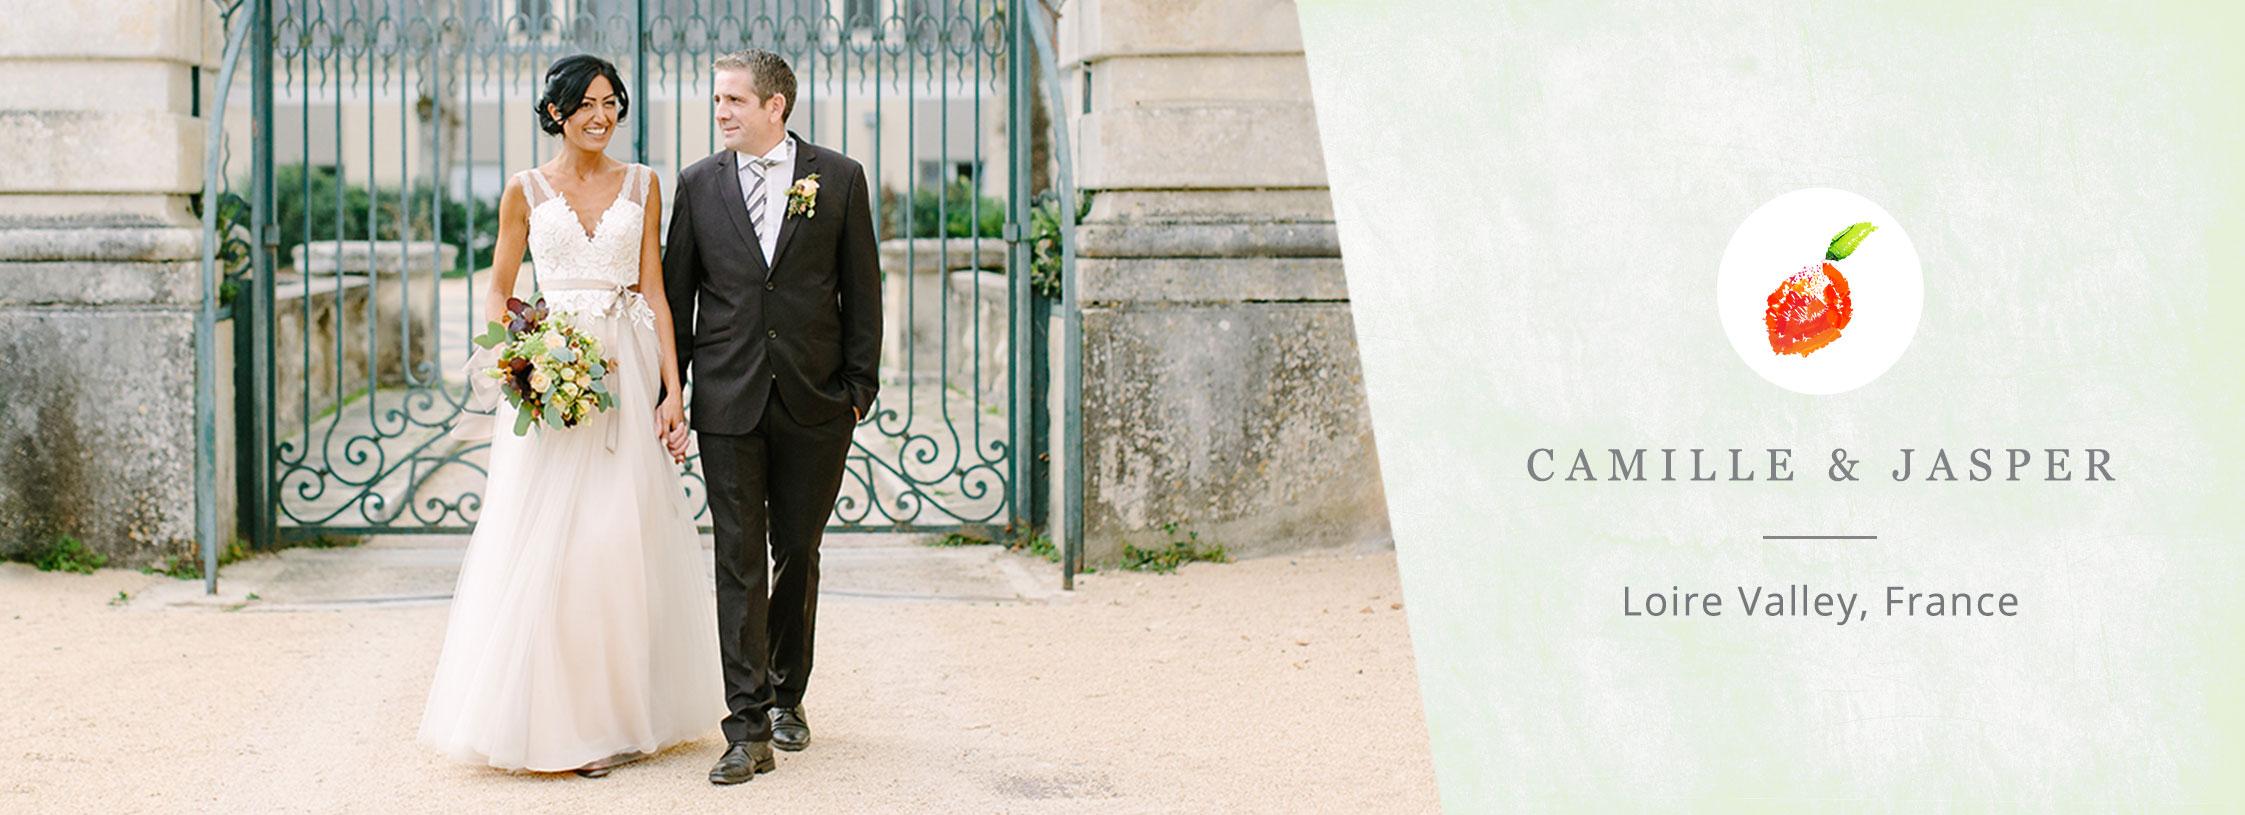 France chateau destination wedding by Destination wedding planner, Mango Muse Events